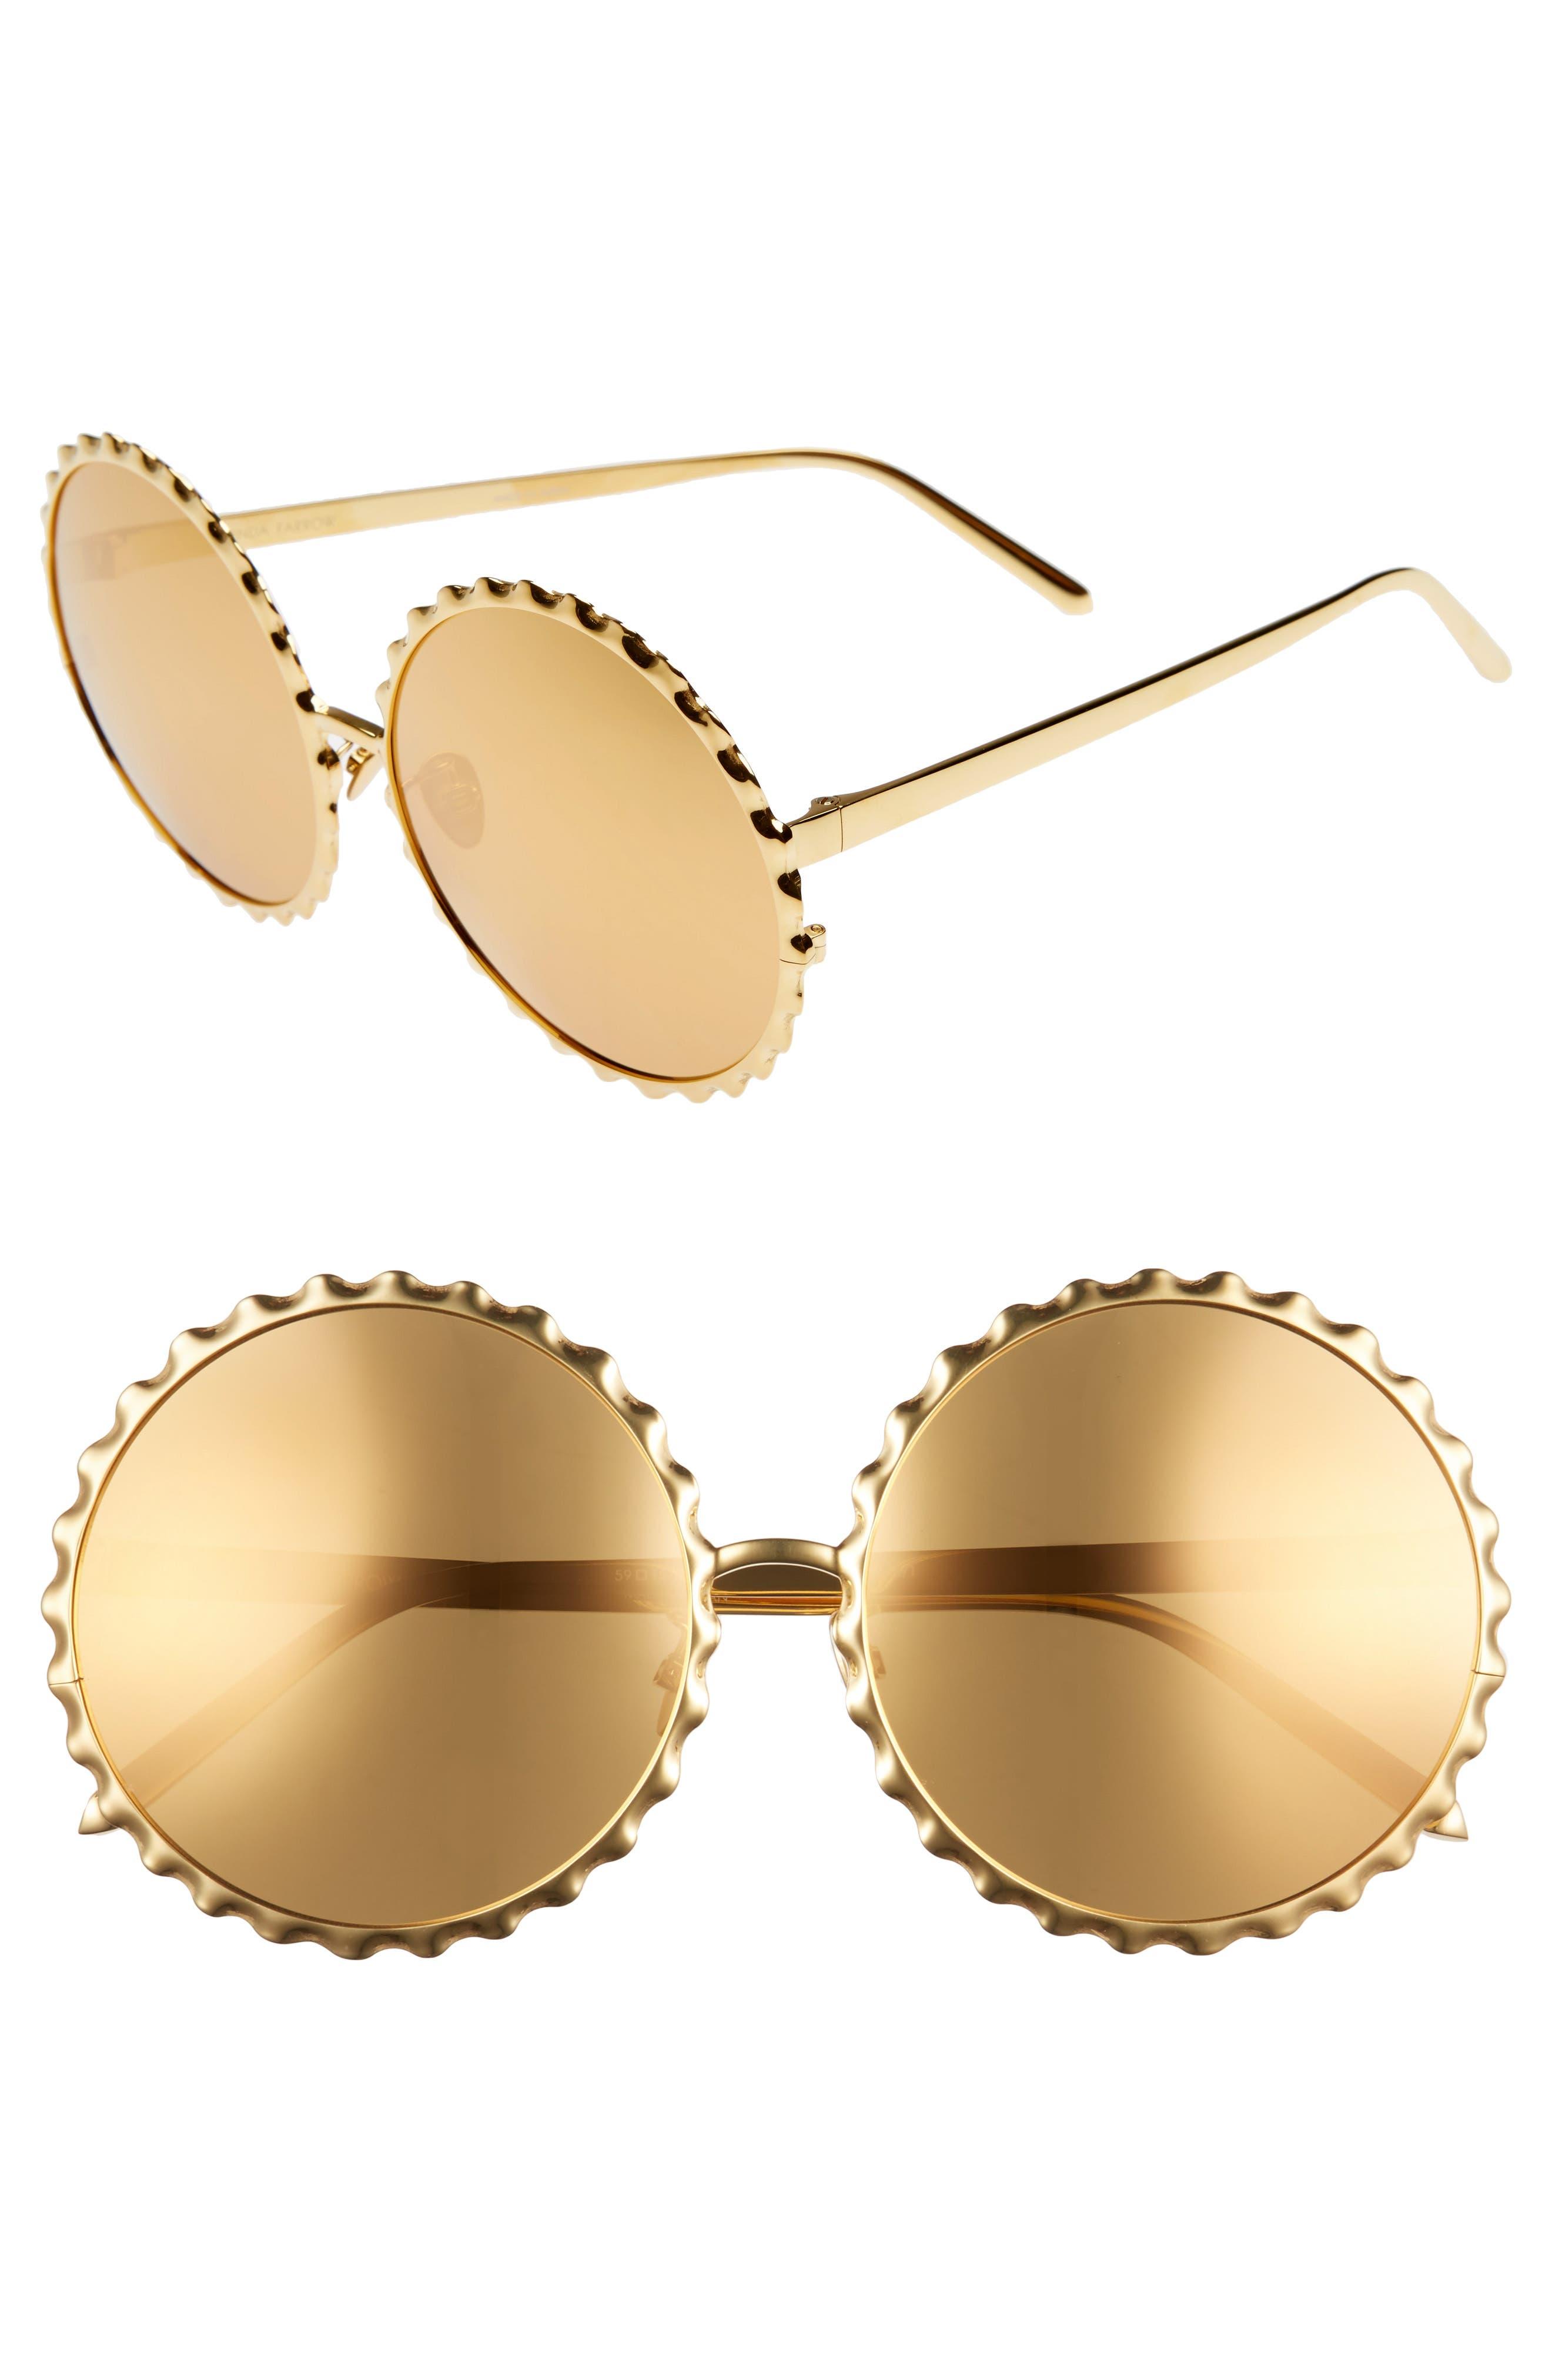 59mm Mirrored 18 Karat Gold Trim Round Sunglasses,                             Main thumbnail 1, color,                             Yellow Gold/ Gold